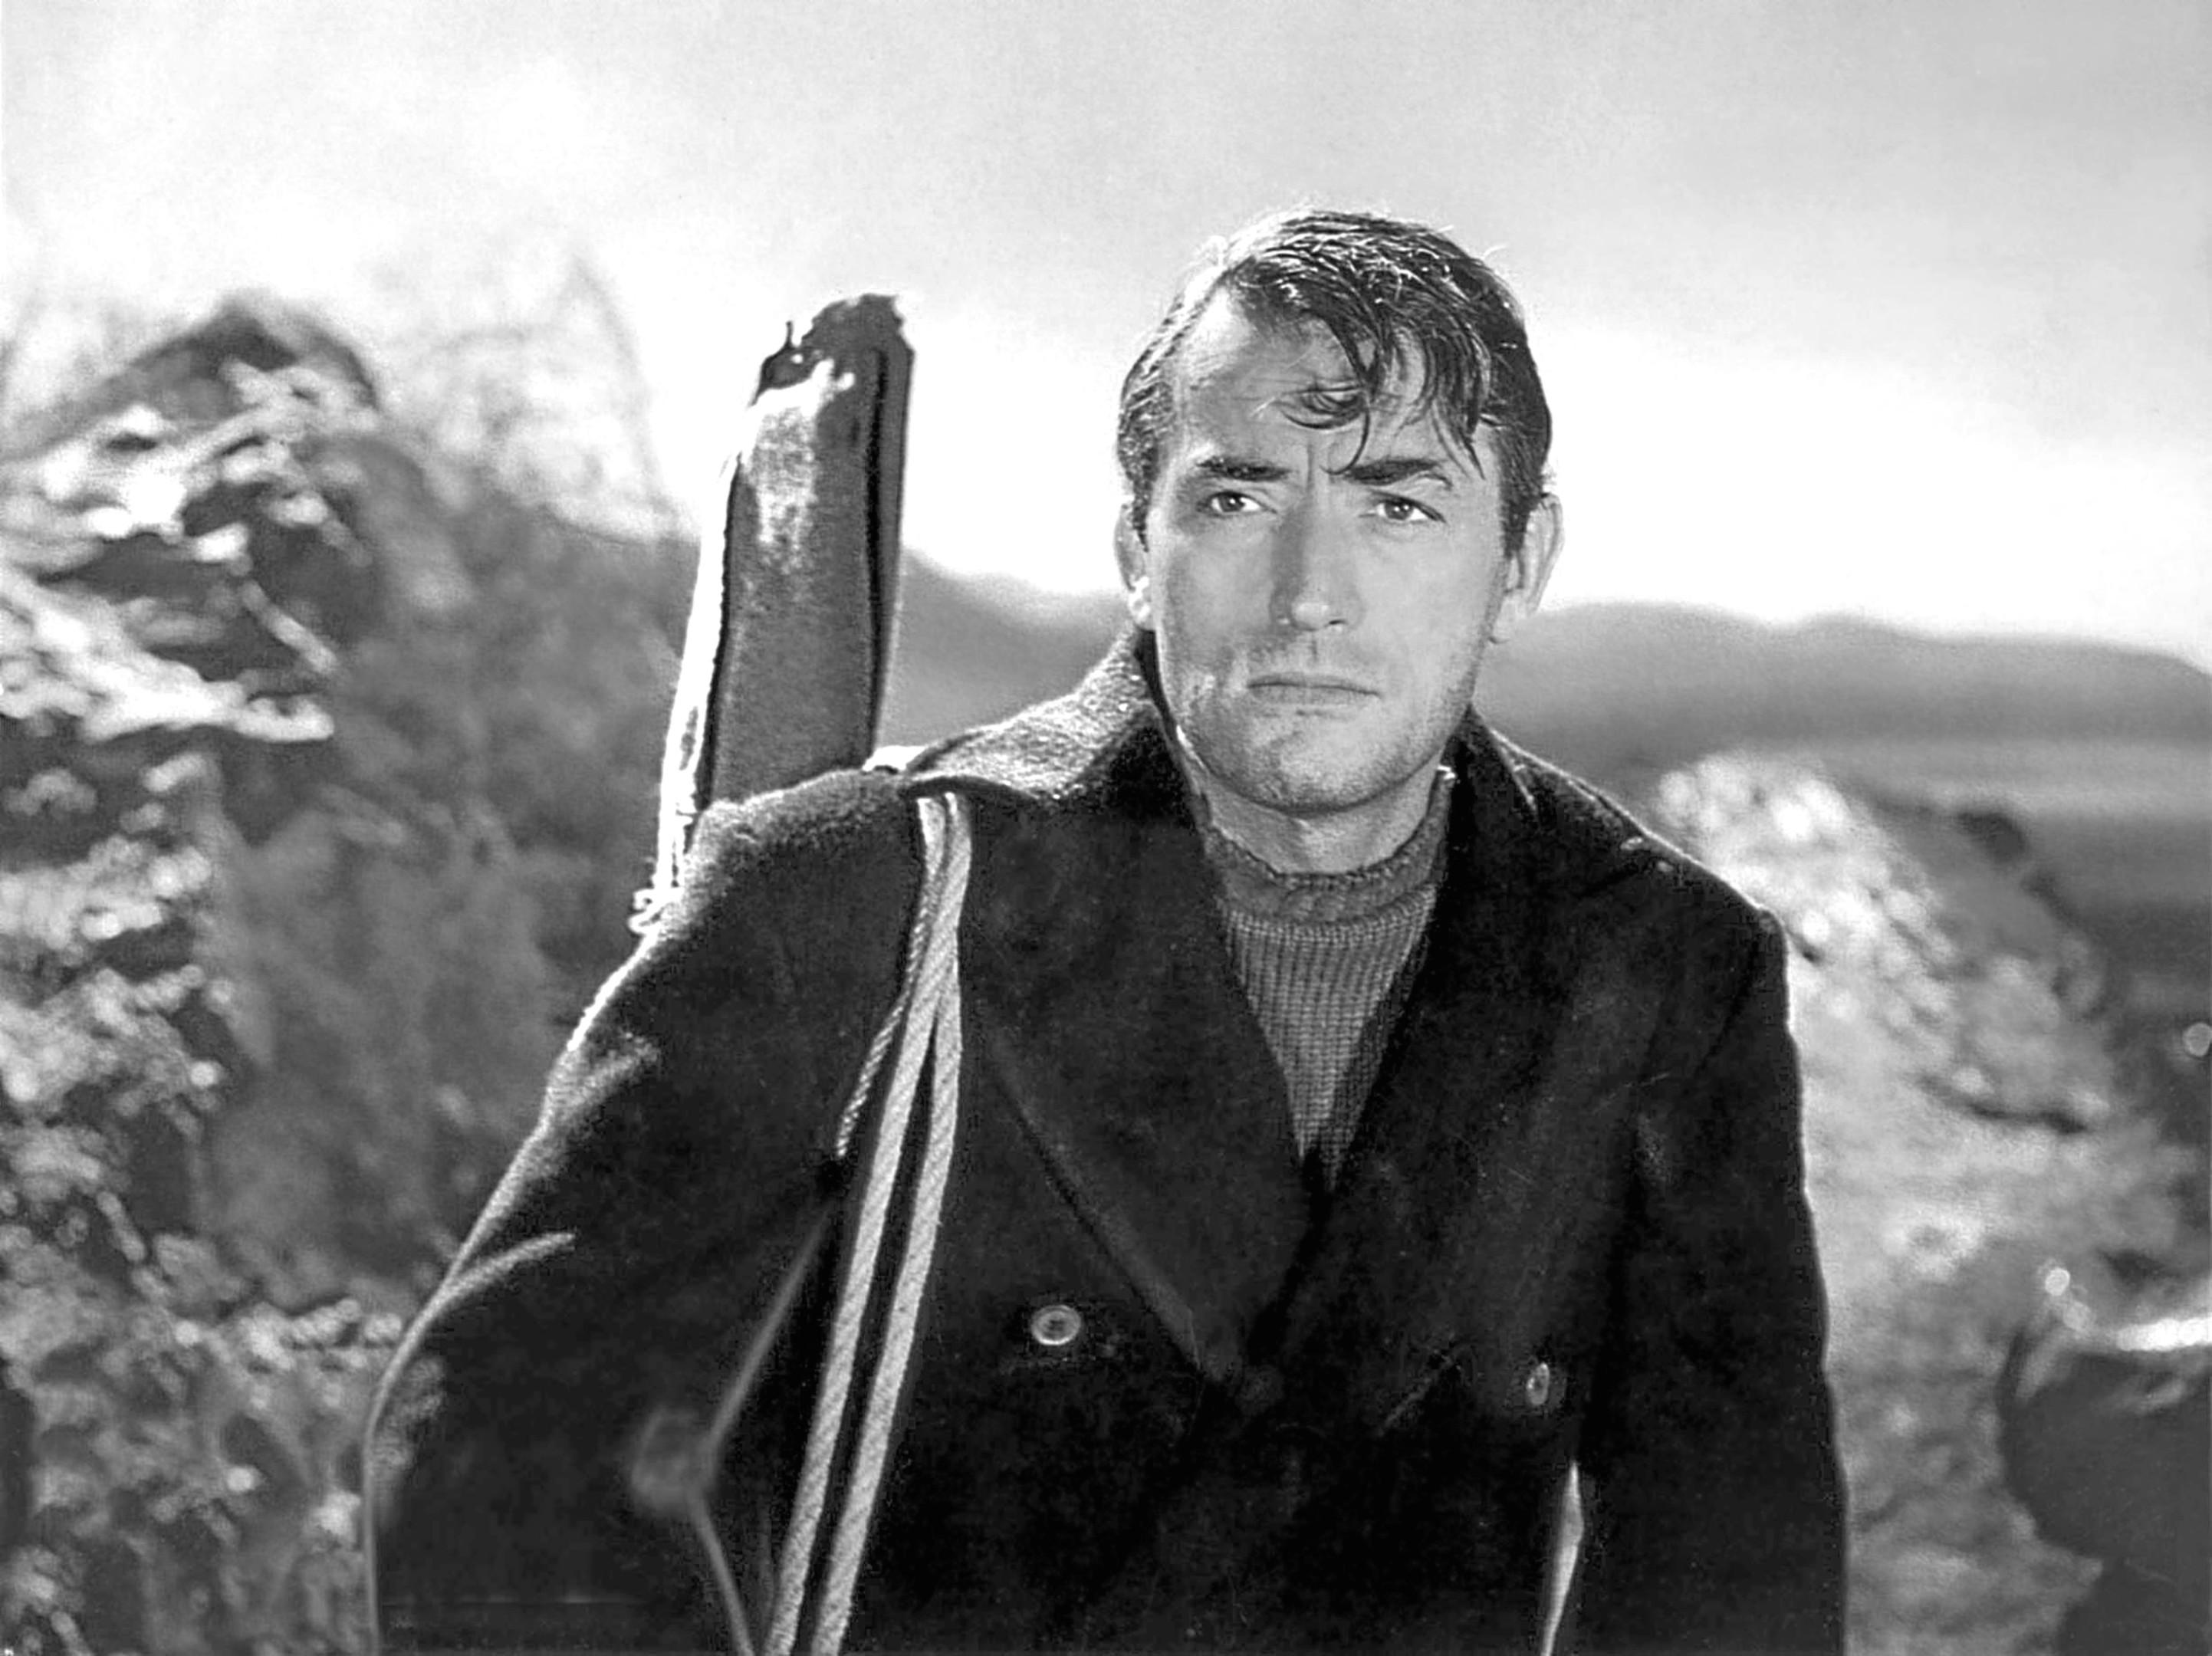 Gregory Peck in The Guns of Navarone, 1961 (Allstar/COLUMBIA)